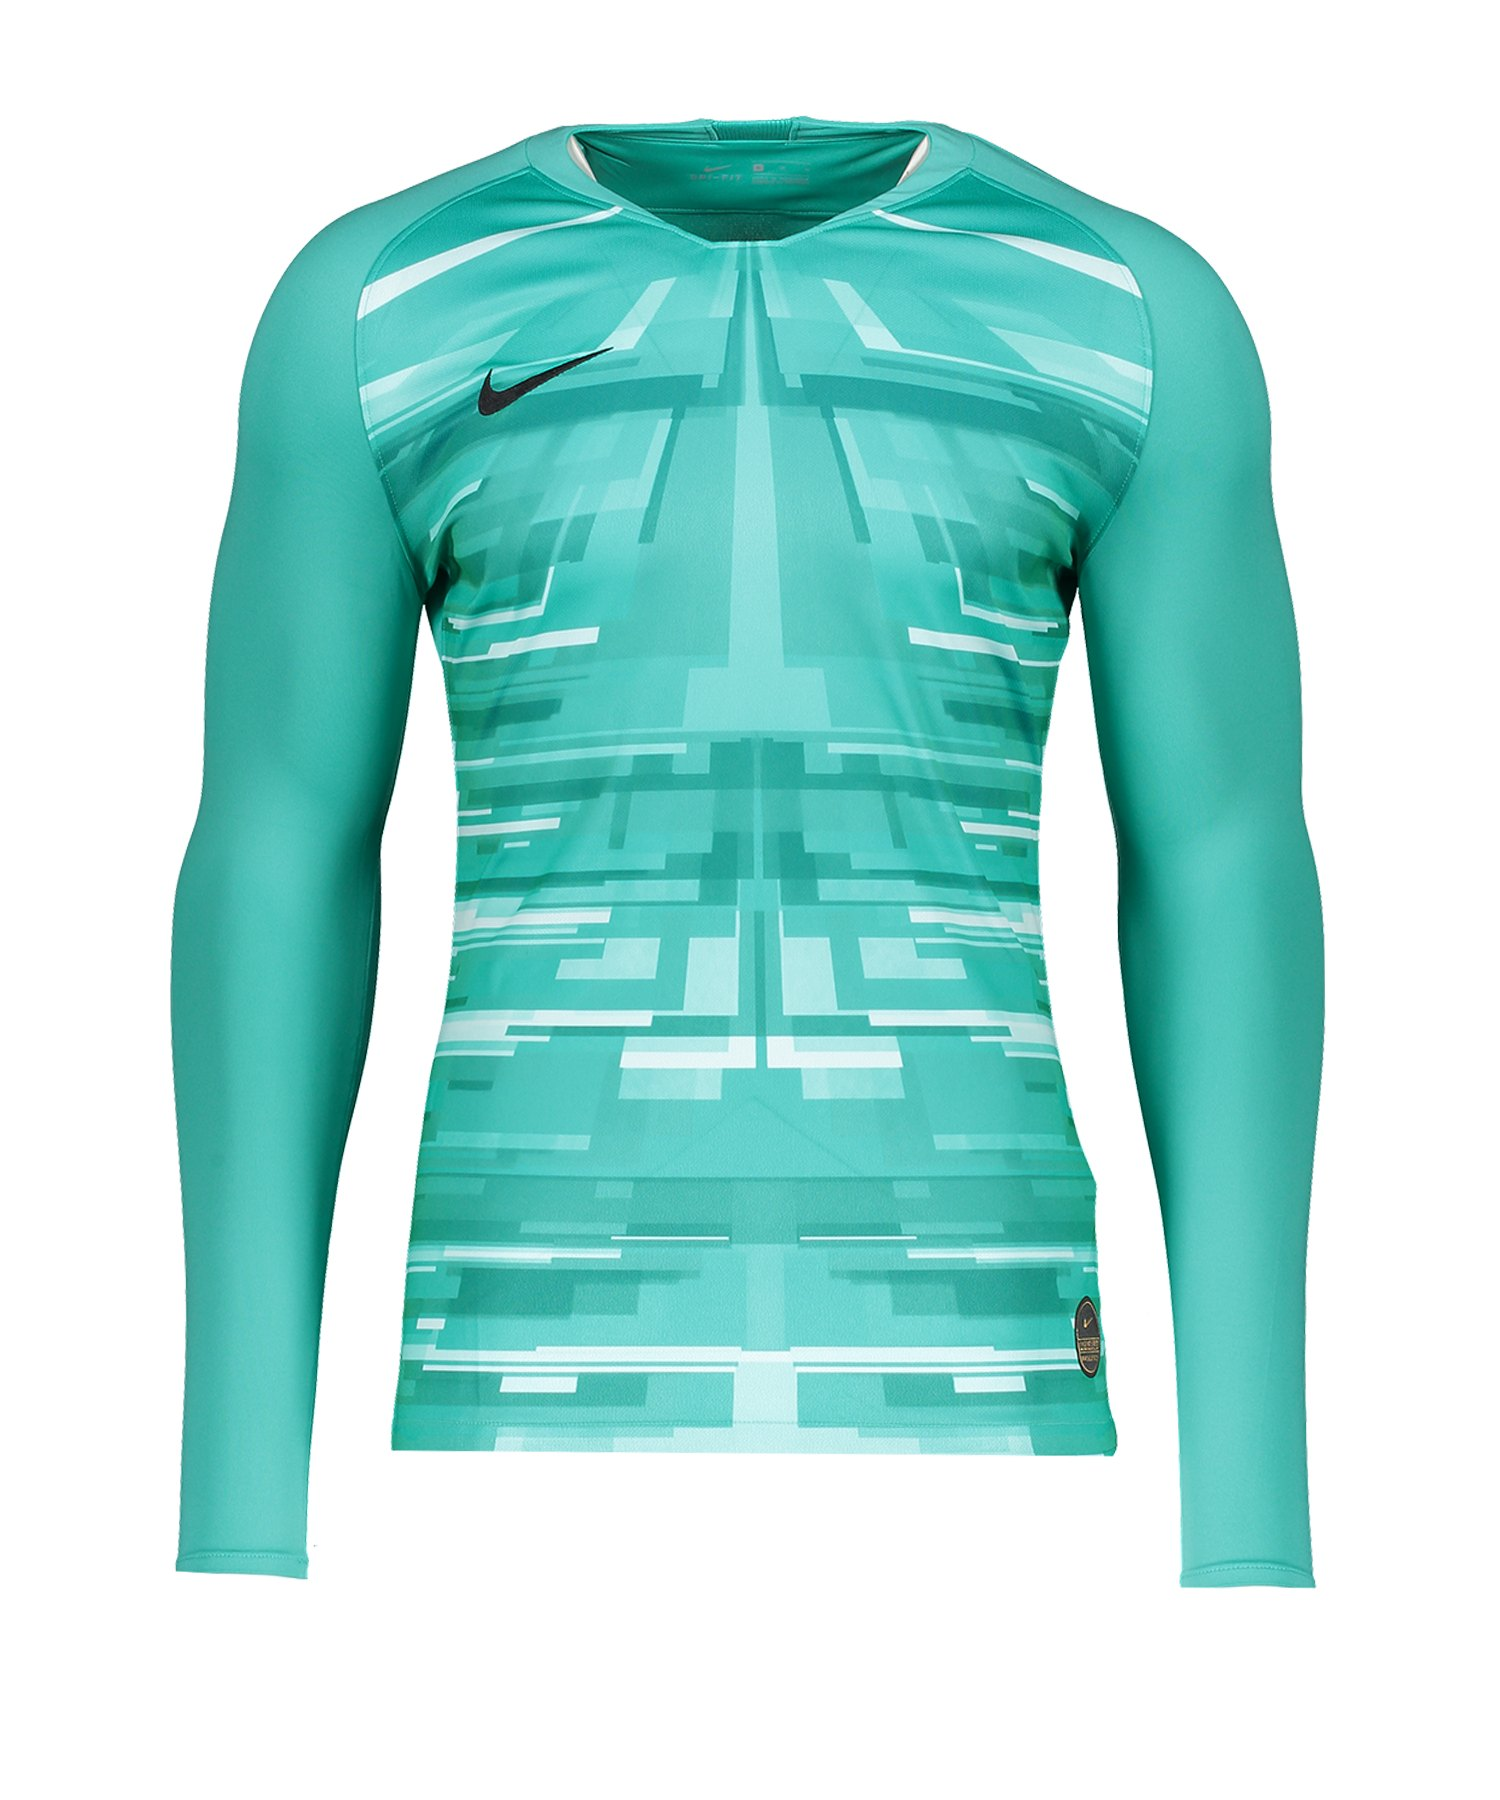 Nike Promo GK-Jersey LS Grün Weiss F317 - blau